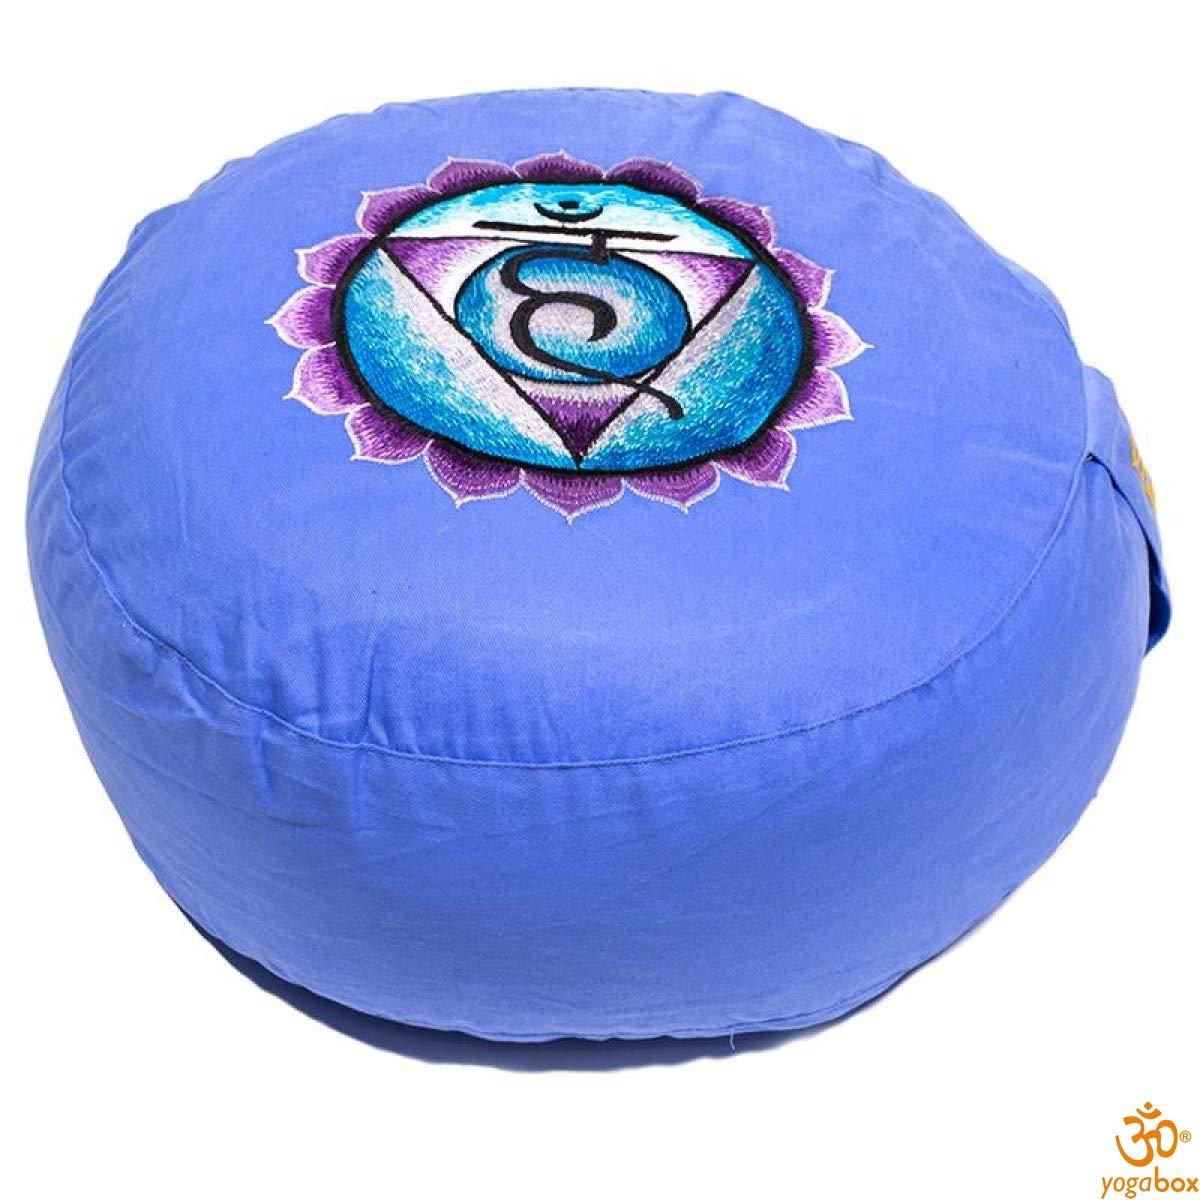 Yogabox Meditation cushions Chakra Gl/ückssitz